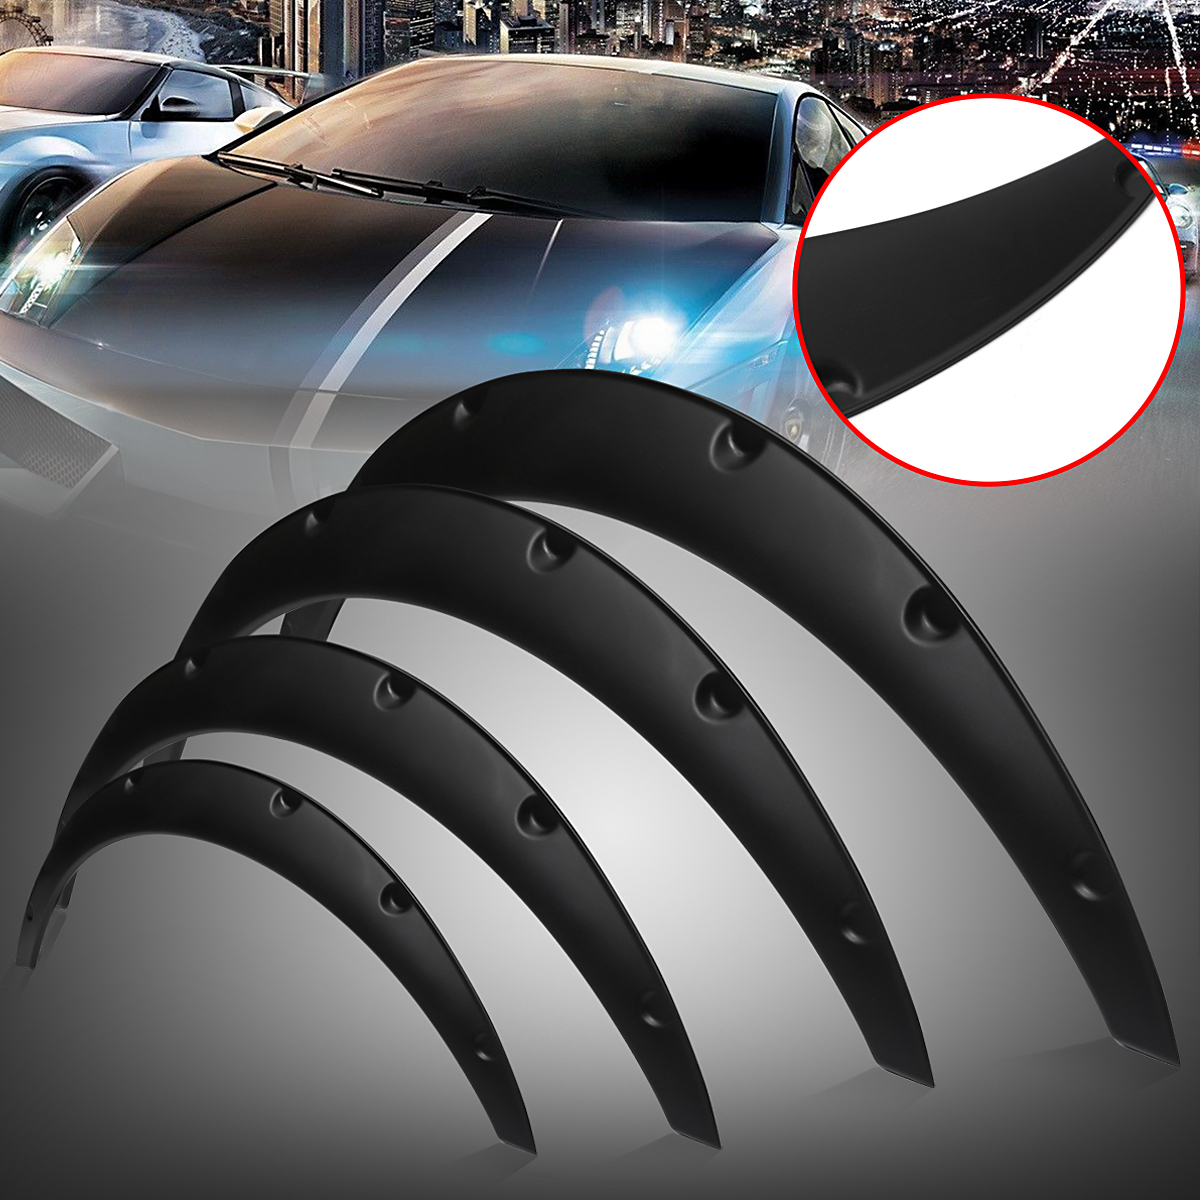 Wheel Fender Flares 4pcs Car SUV Universal Mudguards Flares Arches Wheel Eyebrow Protector Anti-scratch